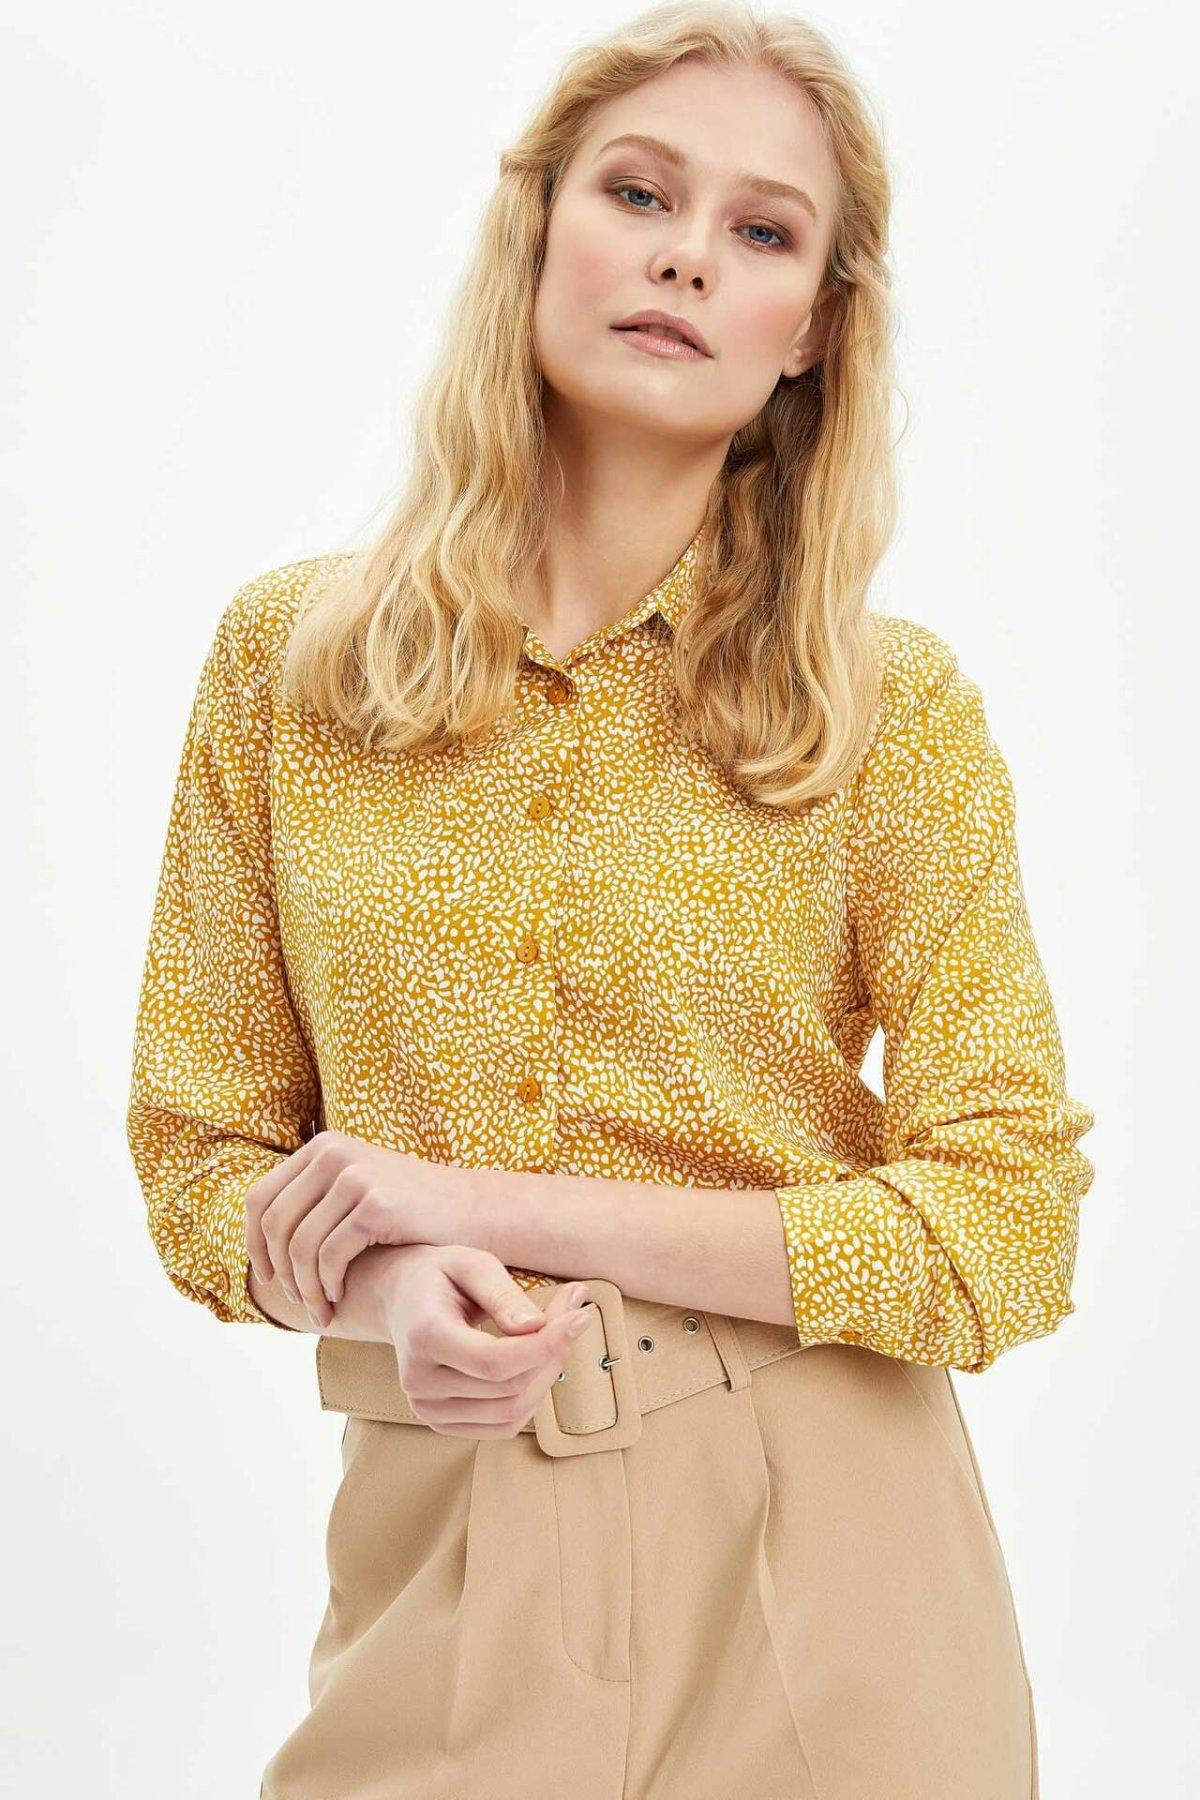 DeFacto Woman Spring Top Shirts Women Chic Yellow Shirts Lady Striped Floral Shirts Female Long Sleeve Shirt-I8266AZ20SP